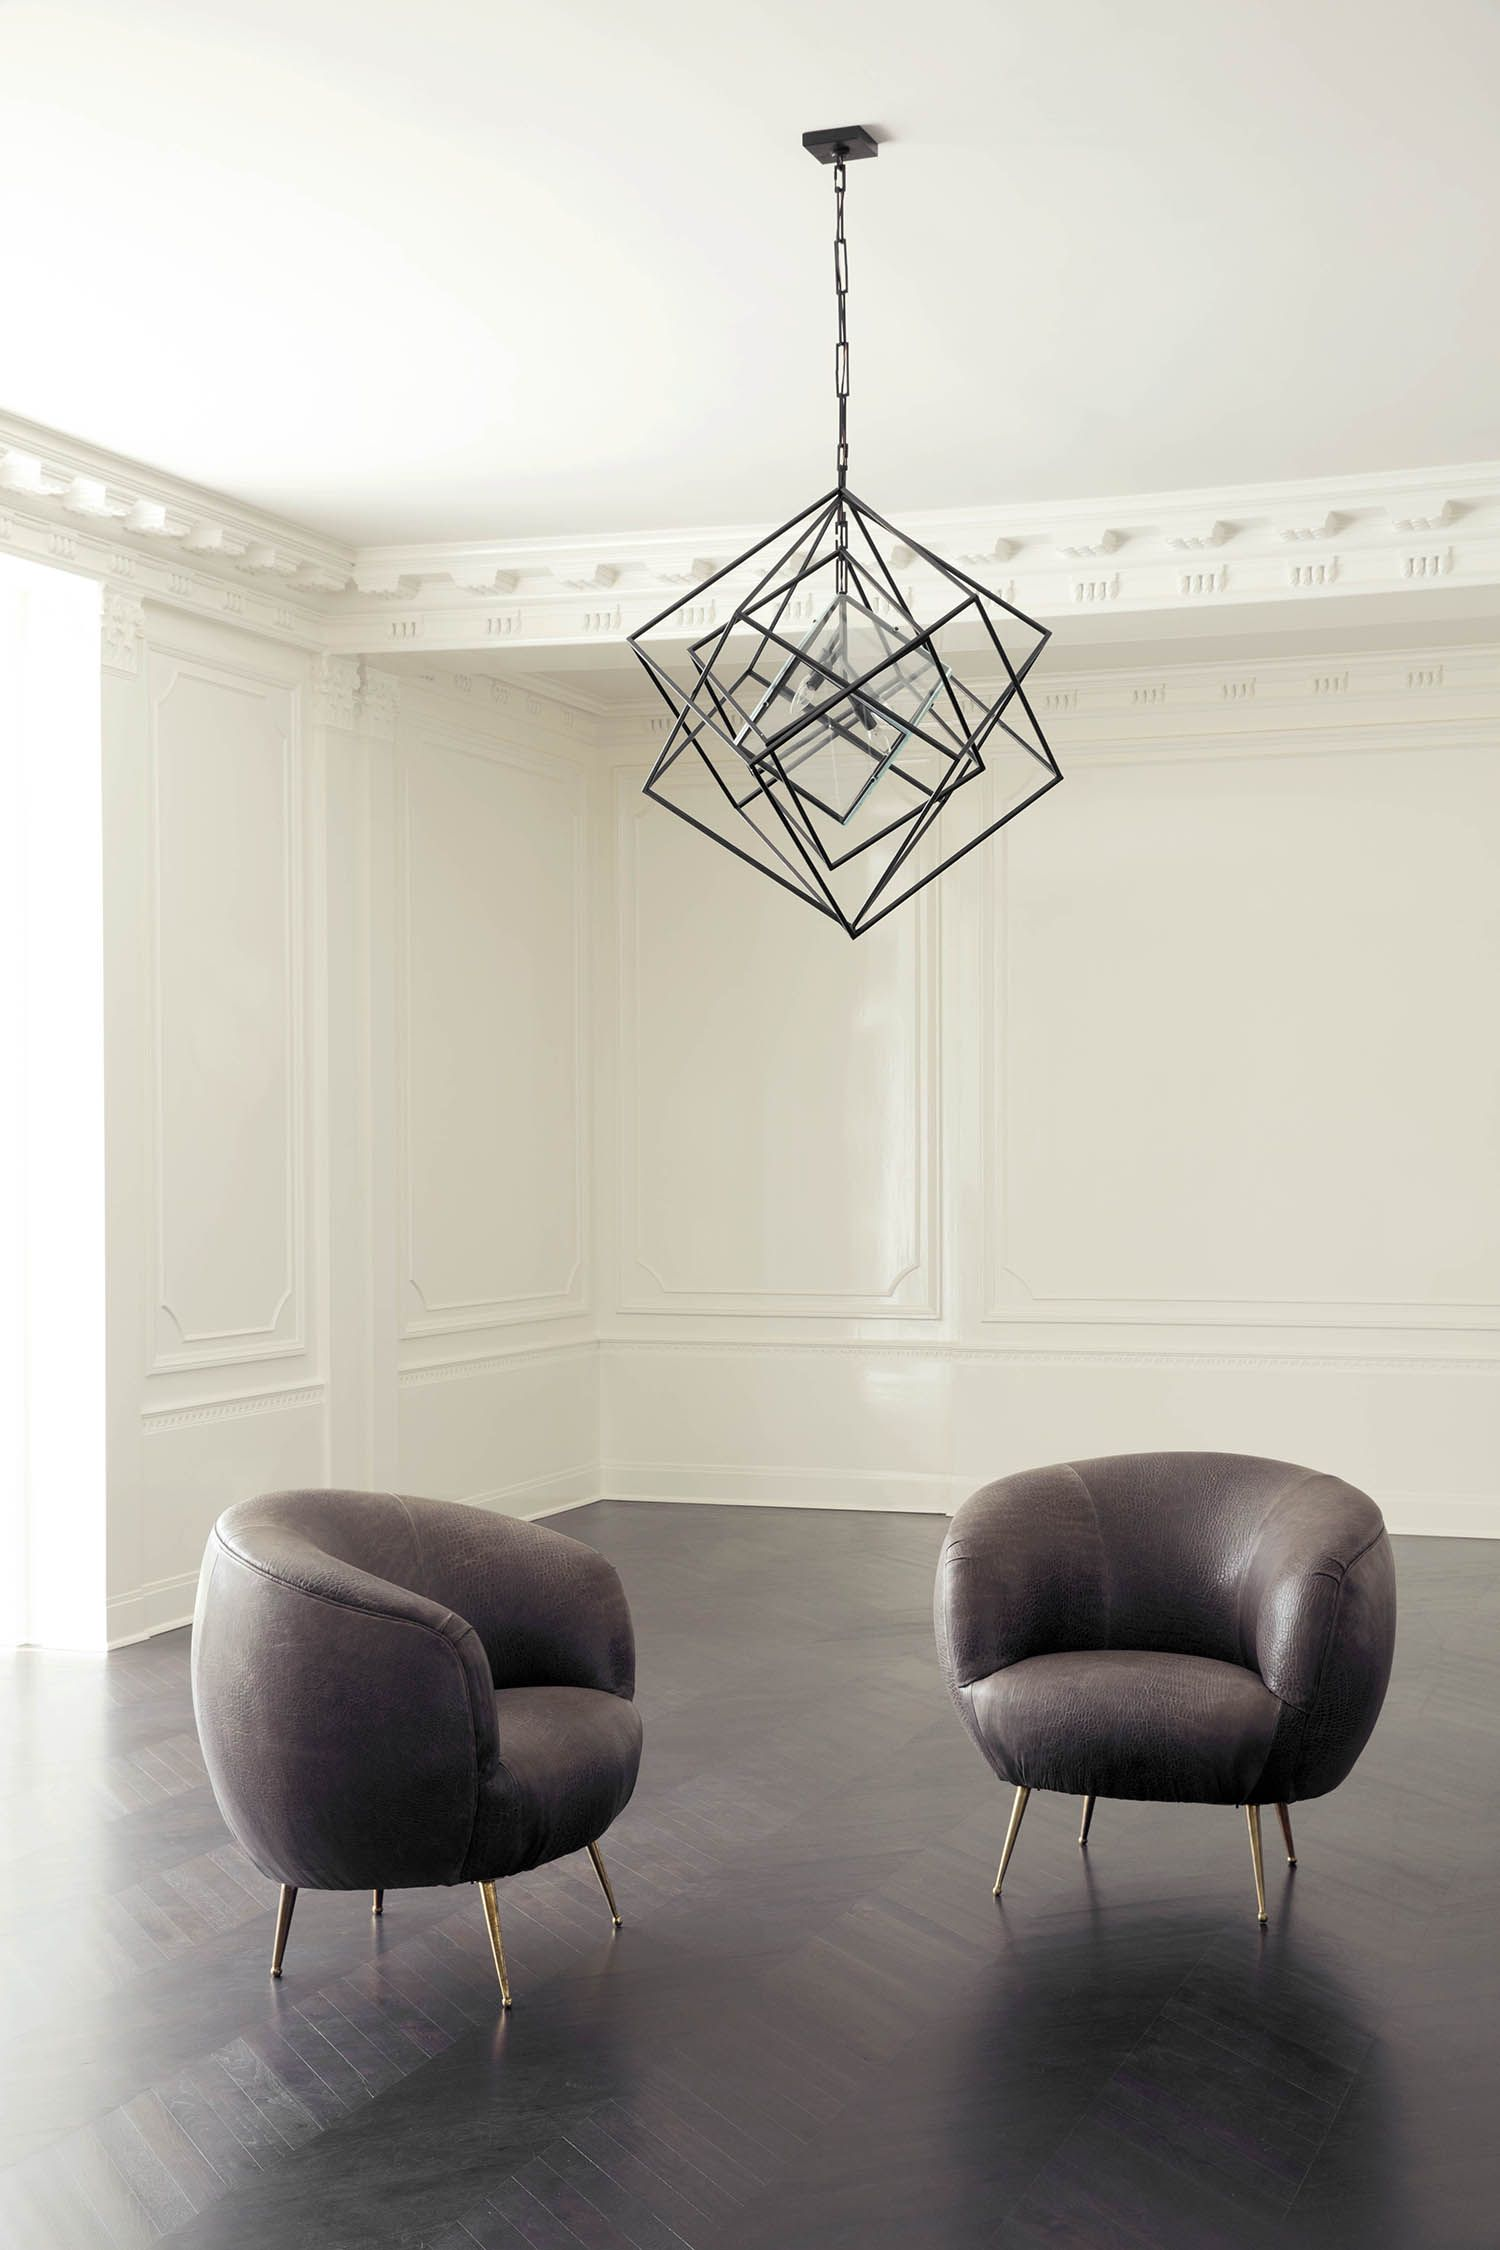 cubism furniture. bedrooms cubism furniture